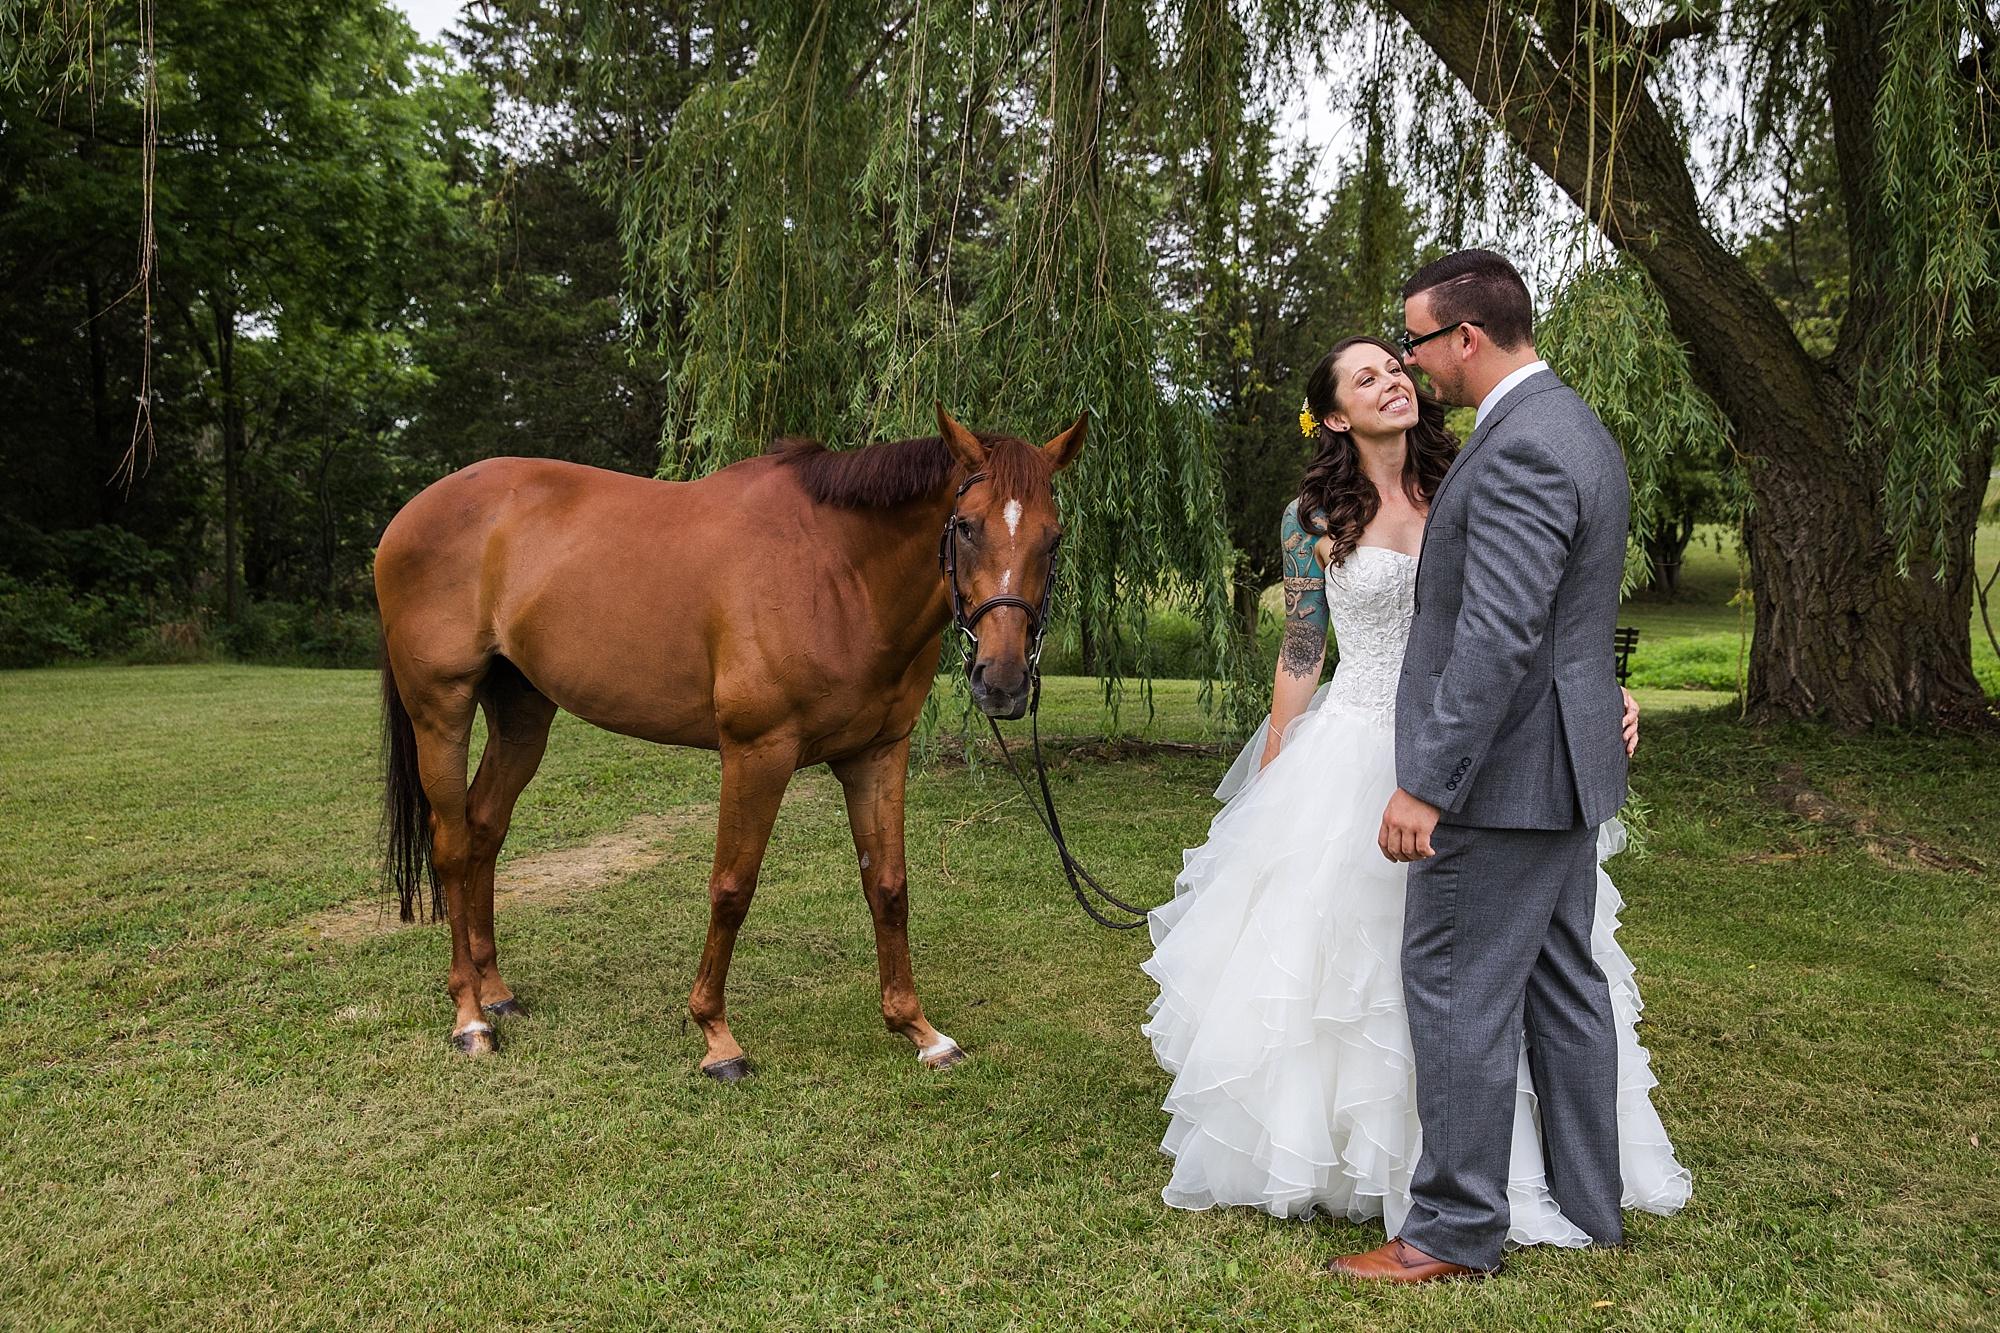 lipapark-hernderwinery-wedding_0050.jpg